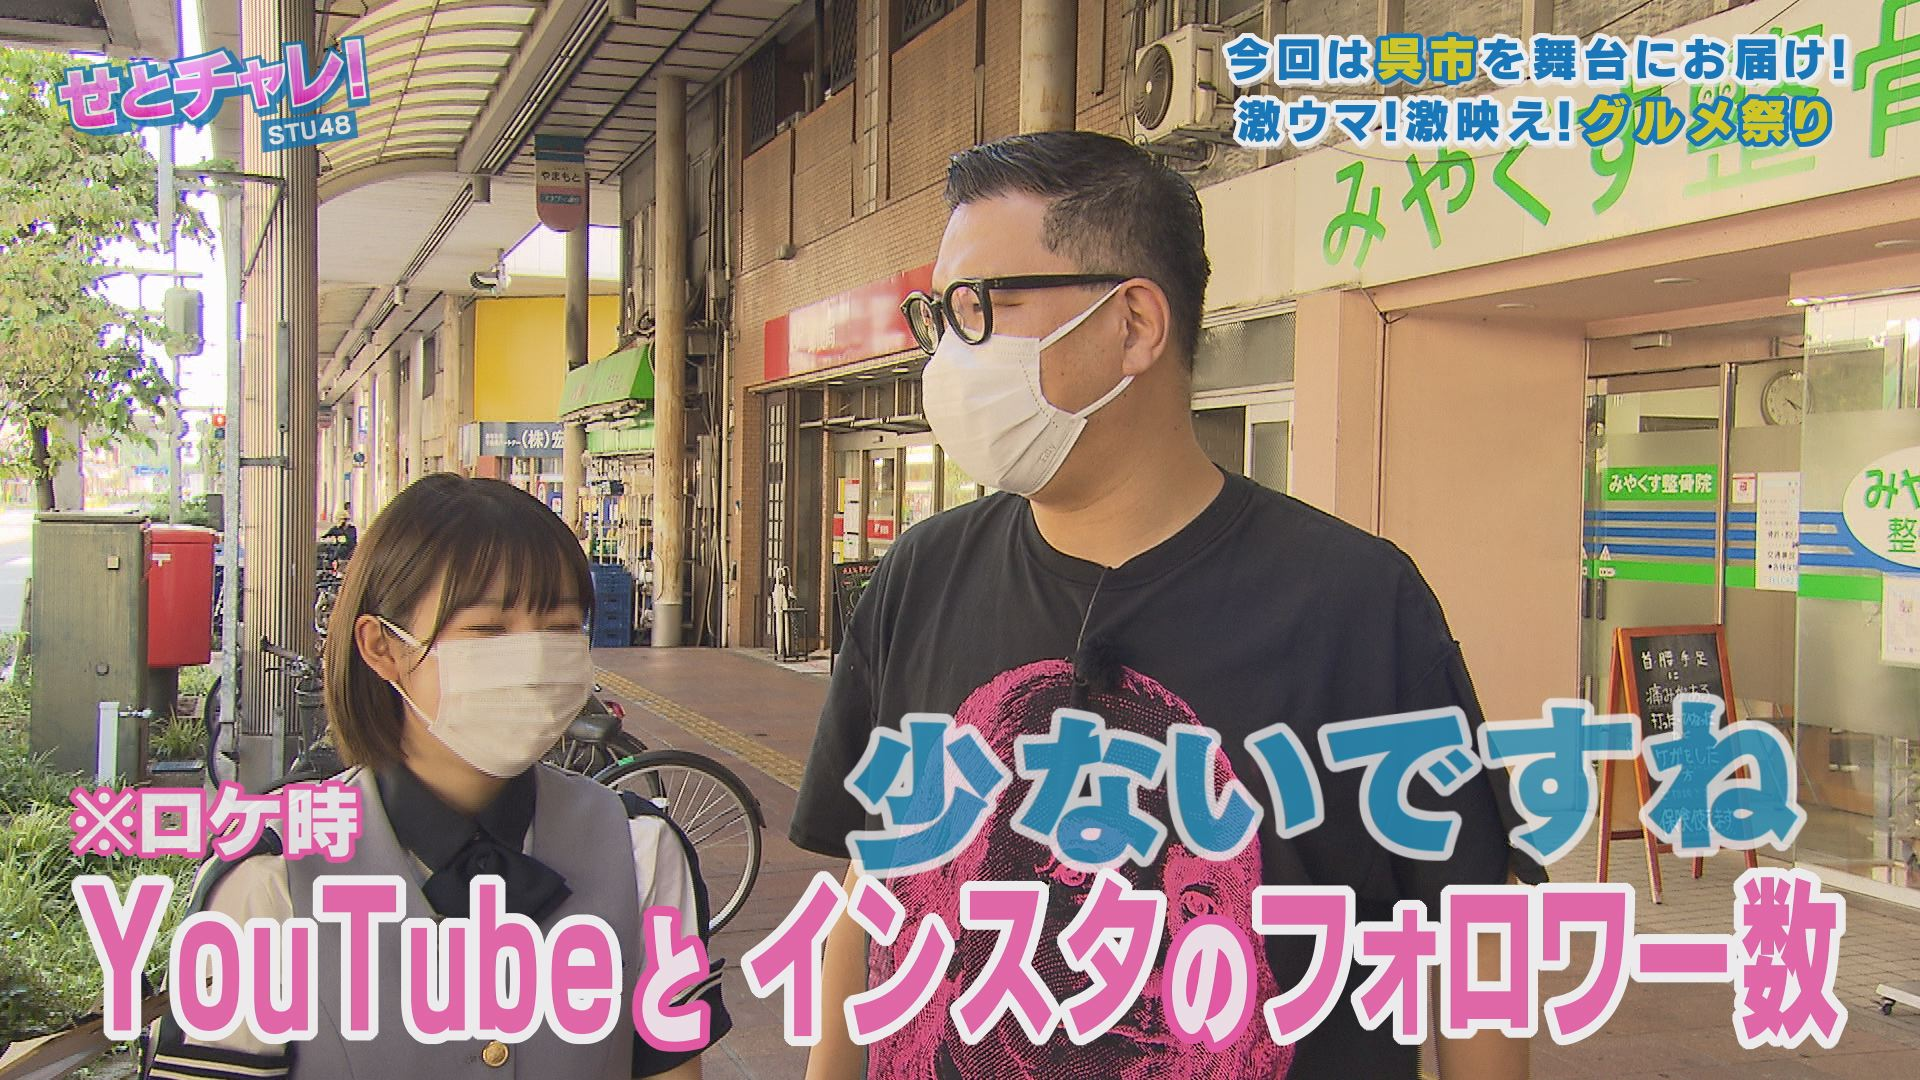 STU48甲斐心愛、シソンヌ長谷川忍